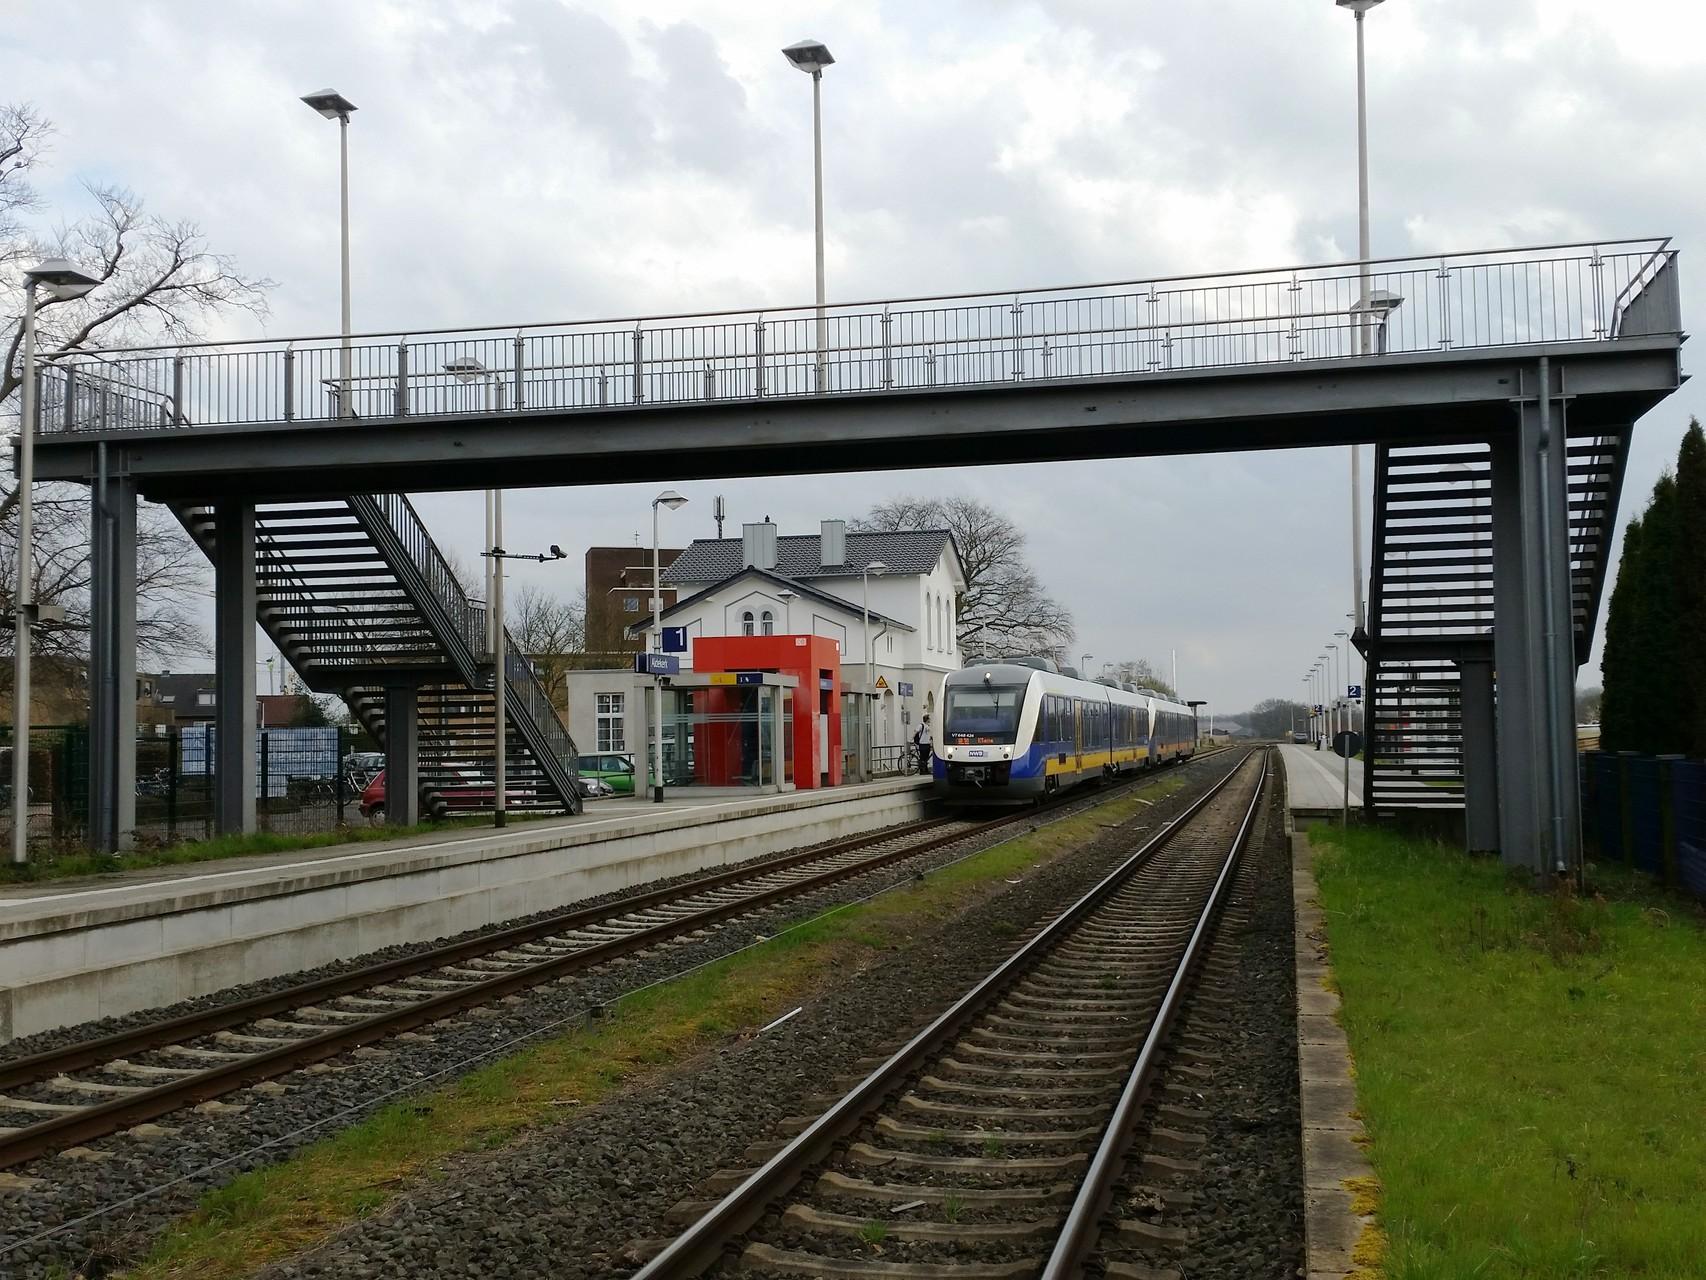 Bahnhof Aldekerk, Strecke Düsseldorf - Krefeld - Kleve im Verkehrsverbund Rhein-Ruhr (VRR)